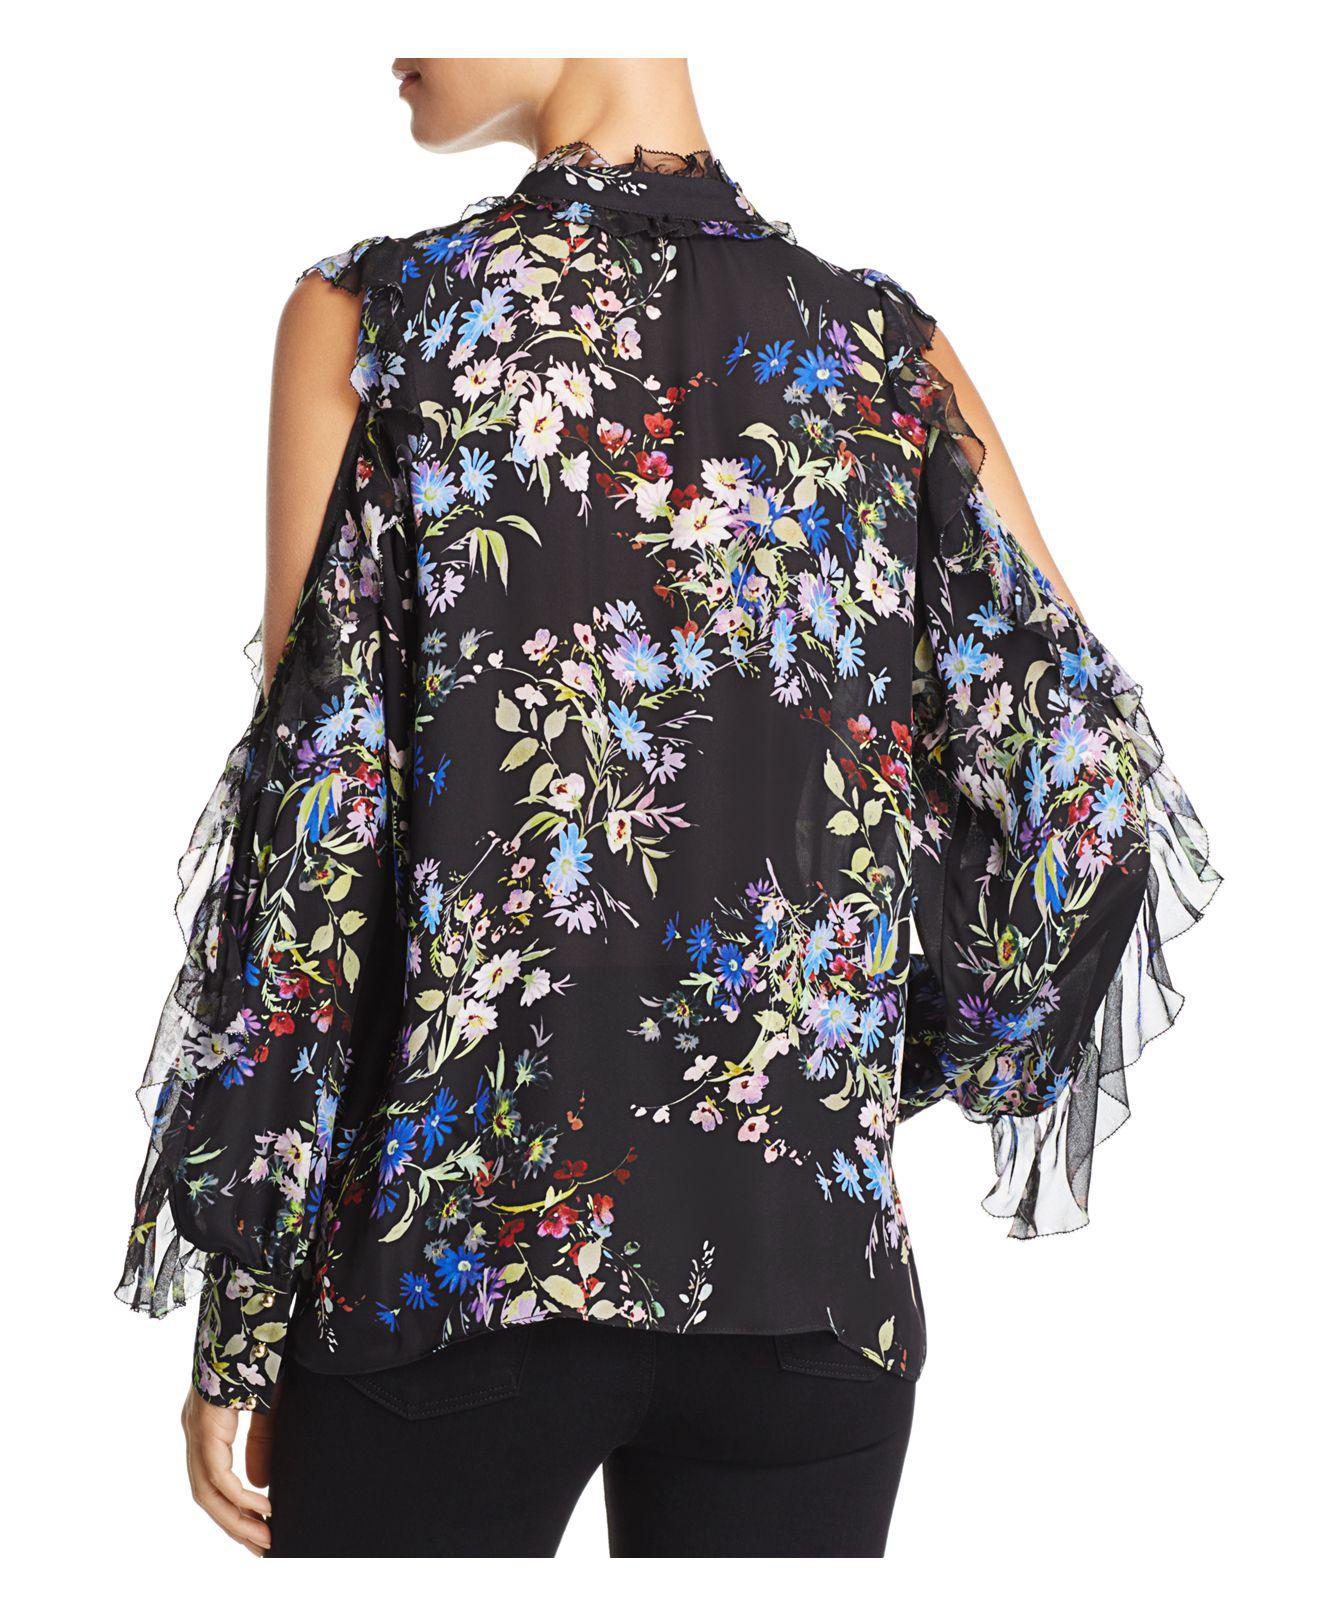 9abfa95918c171 Parker Elana Ruffled Floral-print Cold-shoulder Silk Top in Black - Lyst